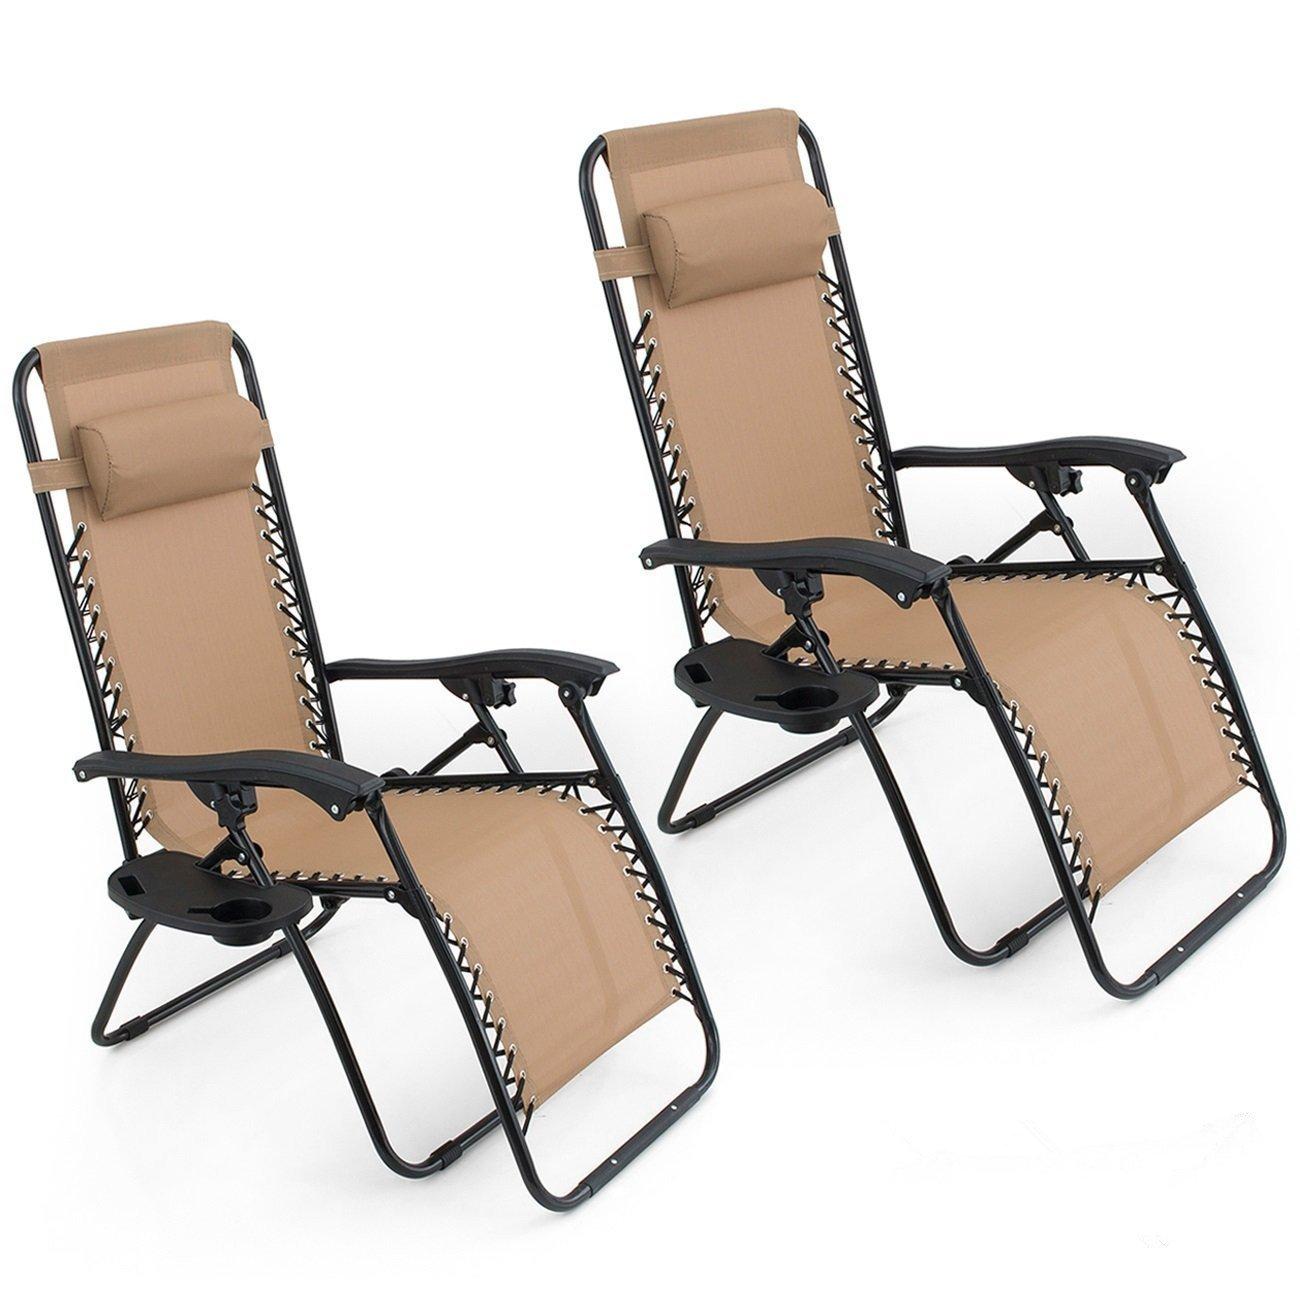 Genial Amazon.com : Oshion 1 Pair Zero Gravity Chairs Black Lounge Patio Chairs  Outdoor Yard Beach New (Tan) : Garden U0026 Outdoor